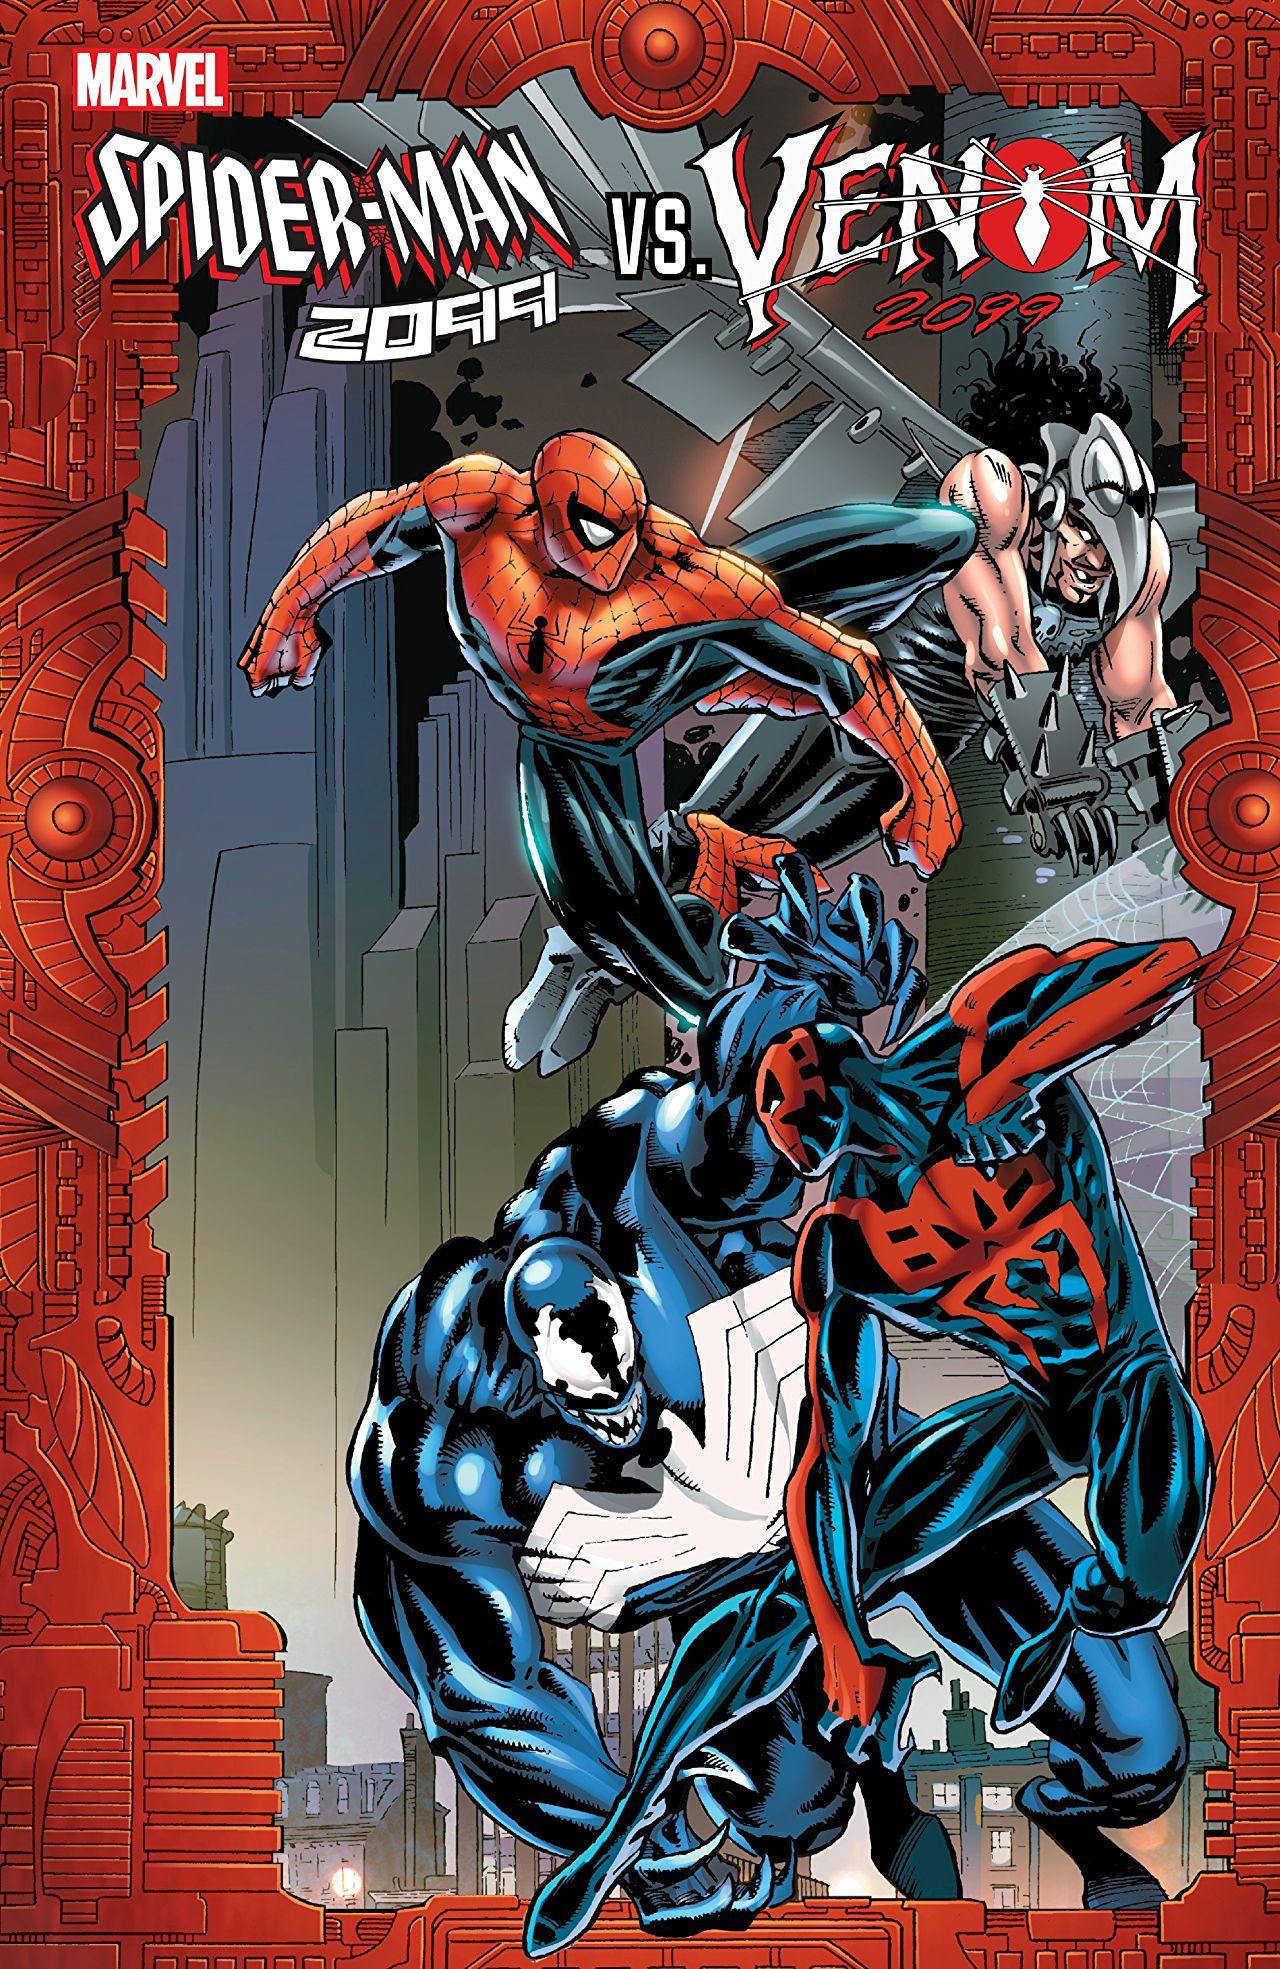 Spider-Man 2099 Vs. Venom 2099 (Trade Paperback)